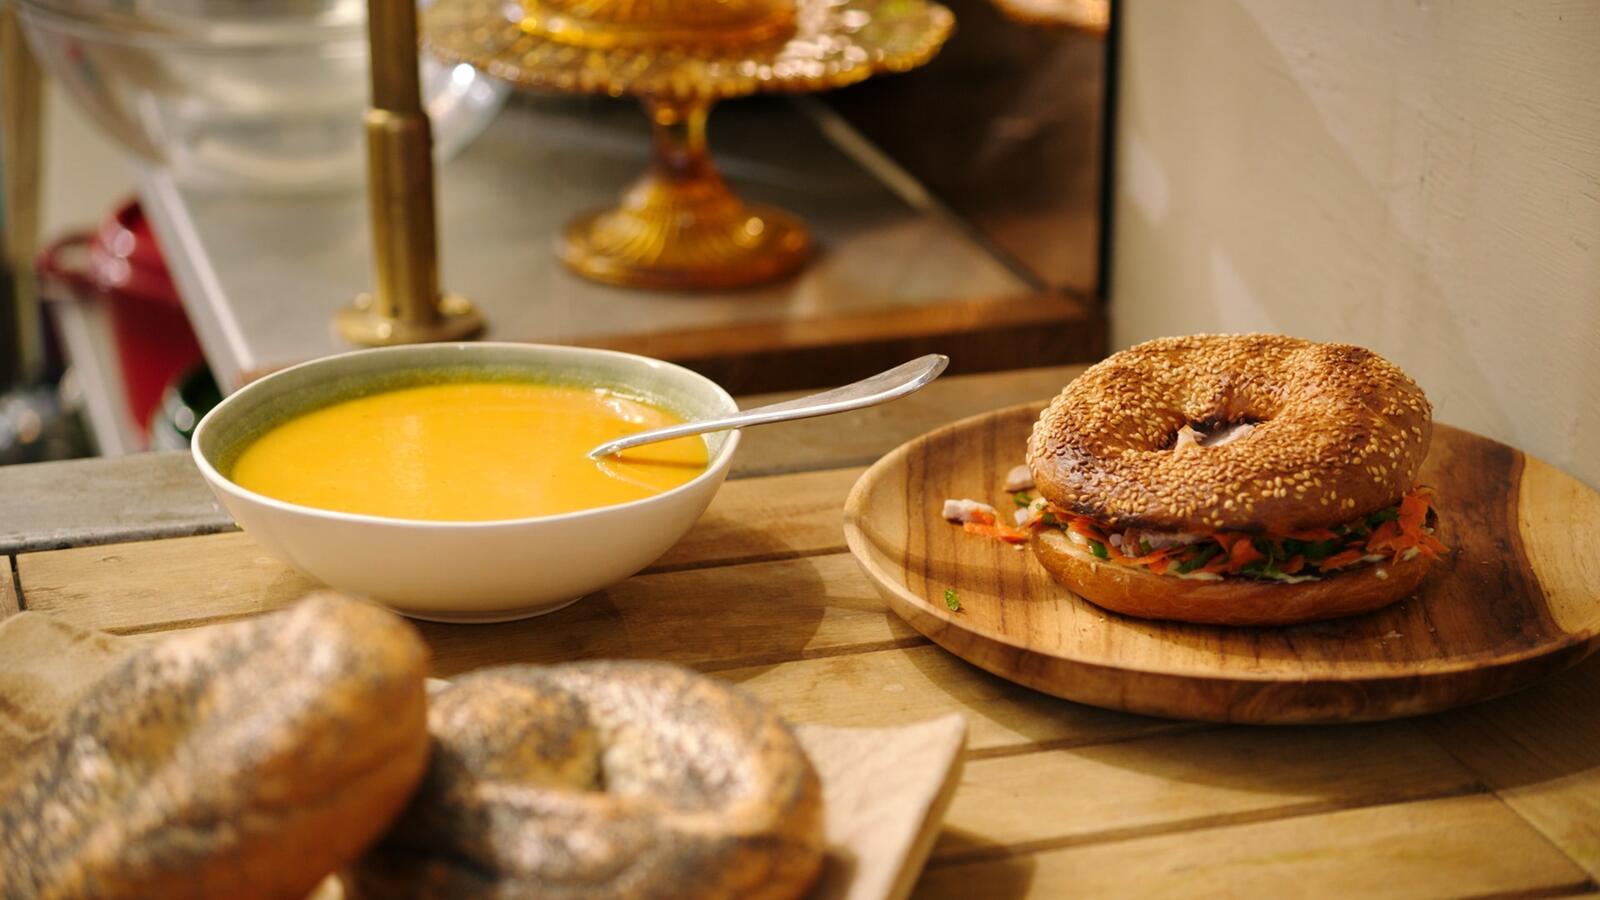 Wortel-gembersoep en bagel met kip en wortelsalade